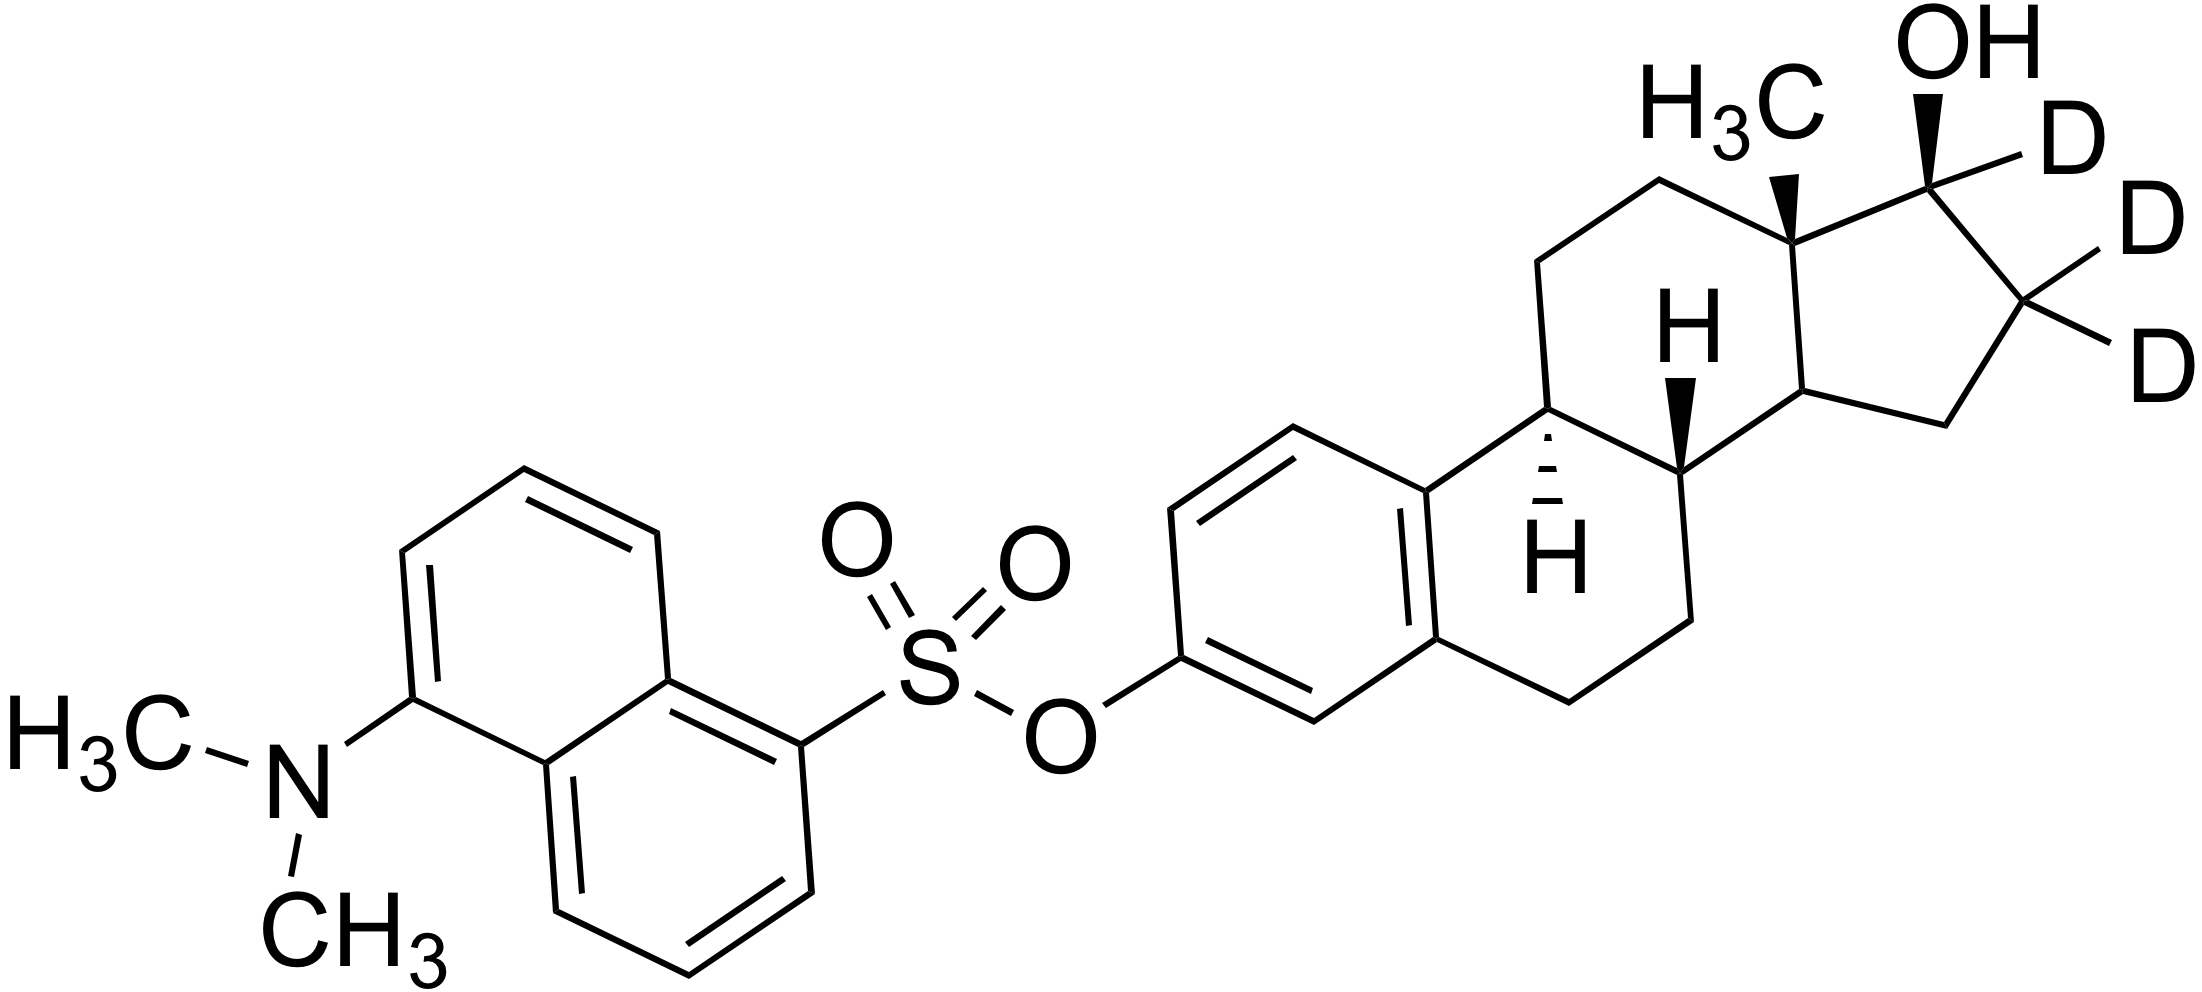 3-Dansyl estradiol-d<sub>3</sub>